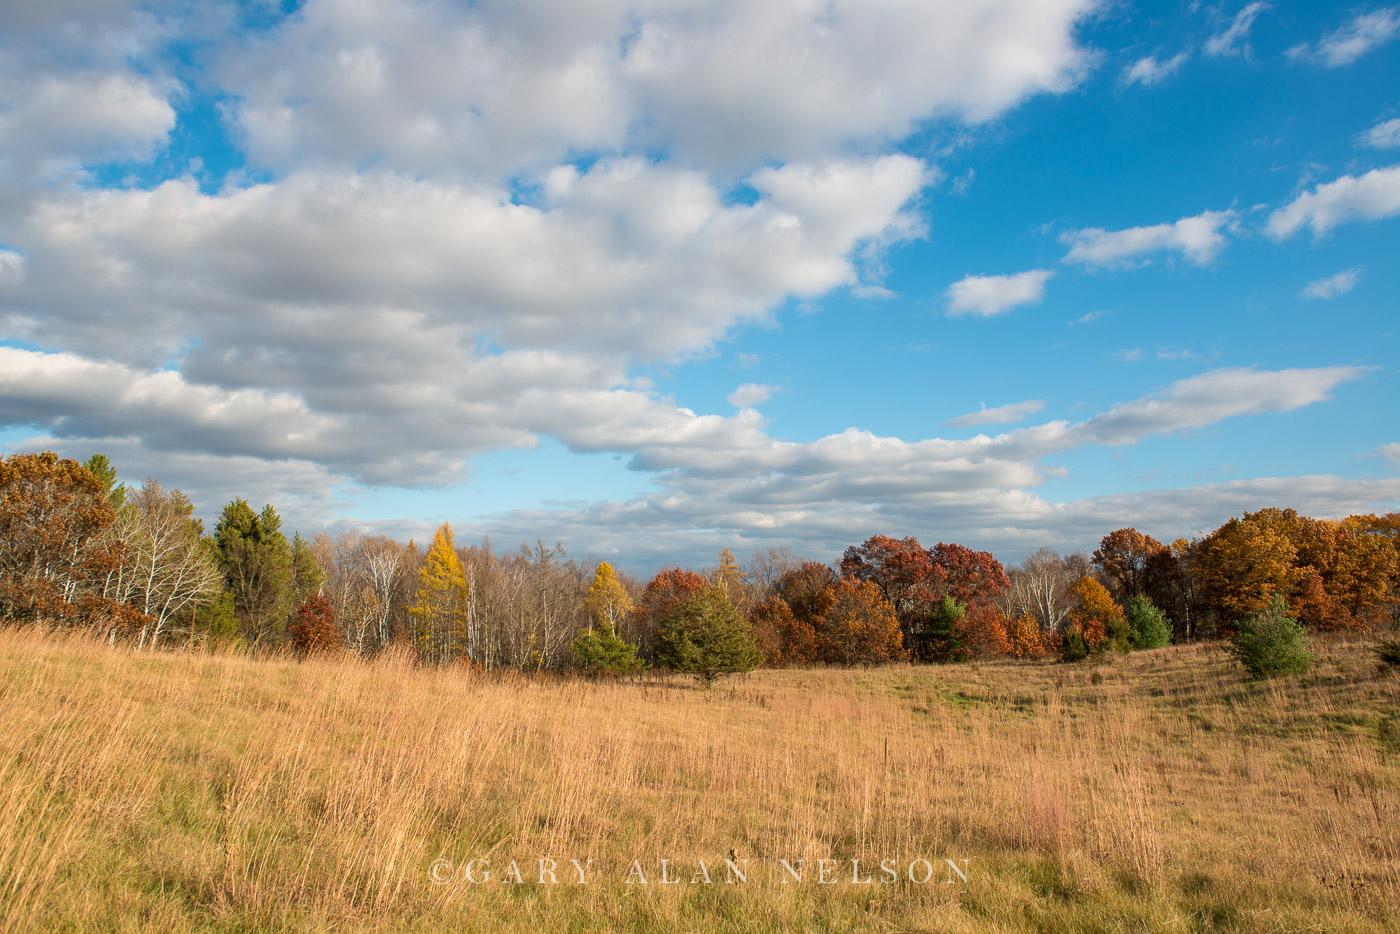 Carlos Avery,autumn,clouds,minnesota,prairie,prairie grass,wildlife management area, photo